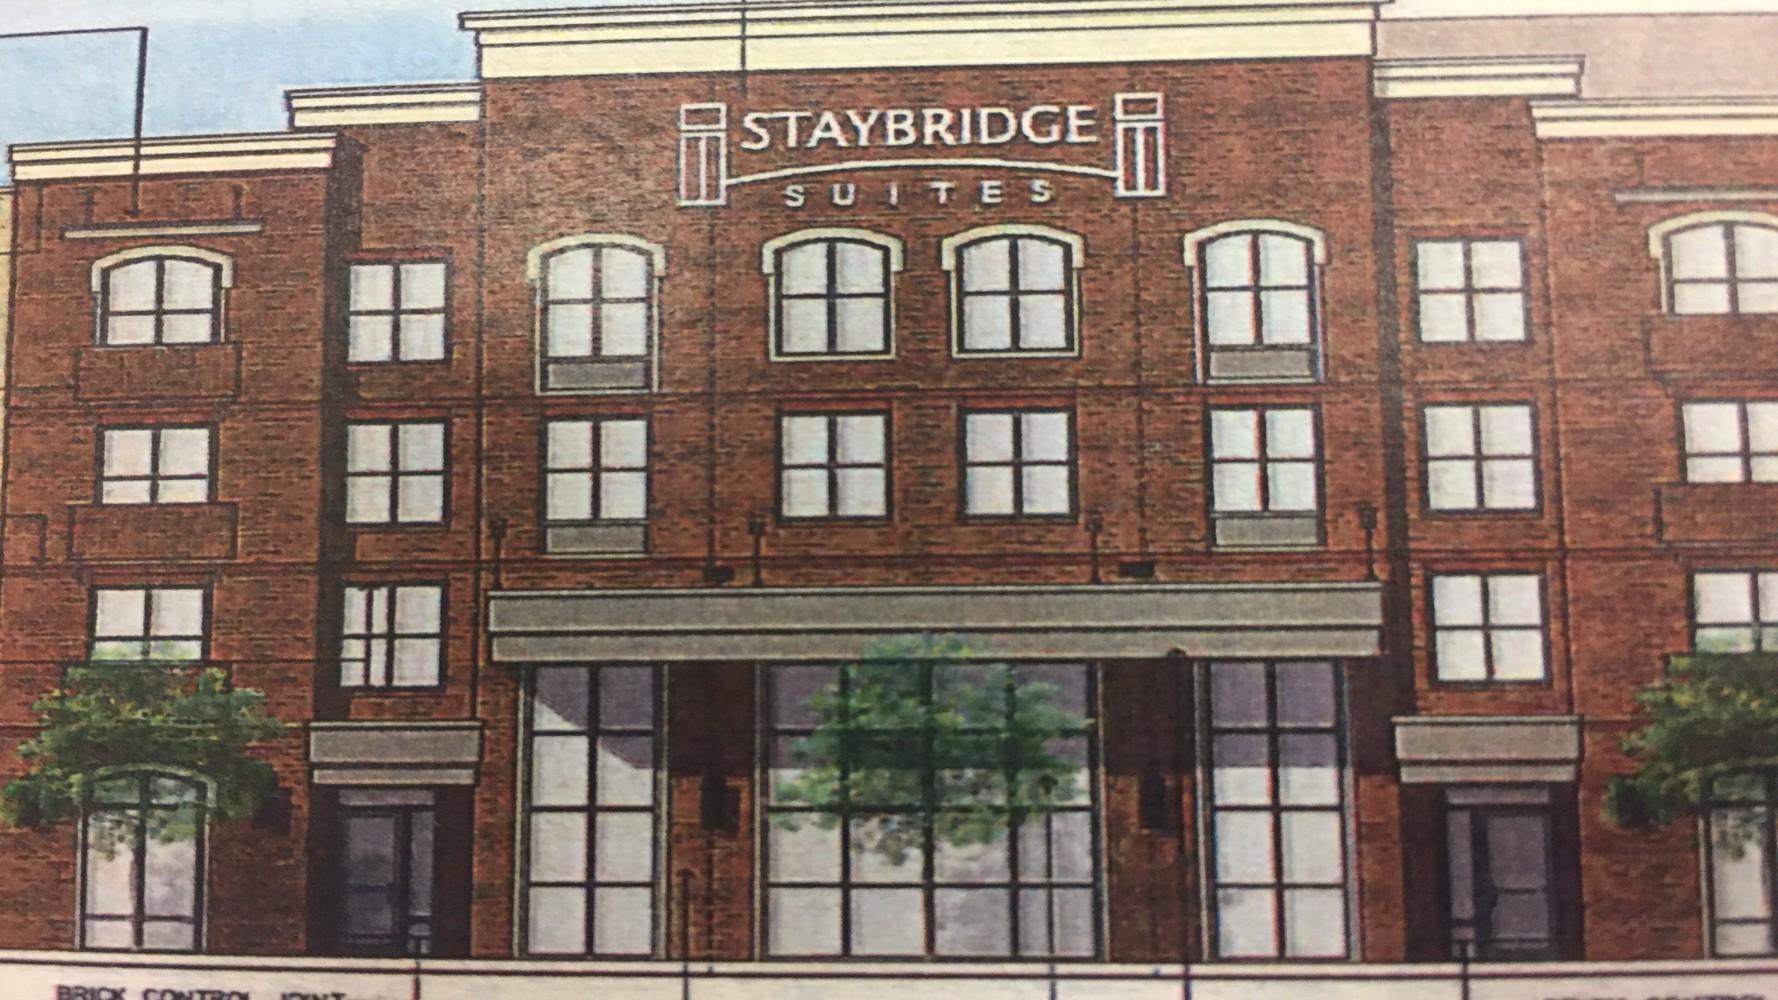 Staybridge Suites By Holiday Inn Charleston   Mount Pleasant